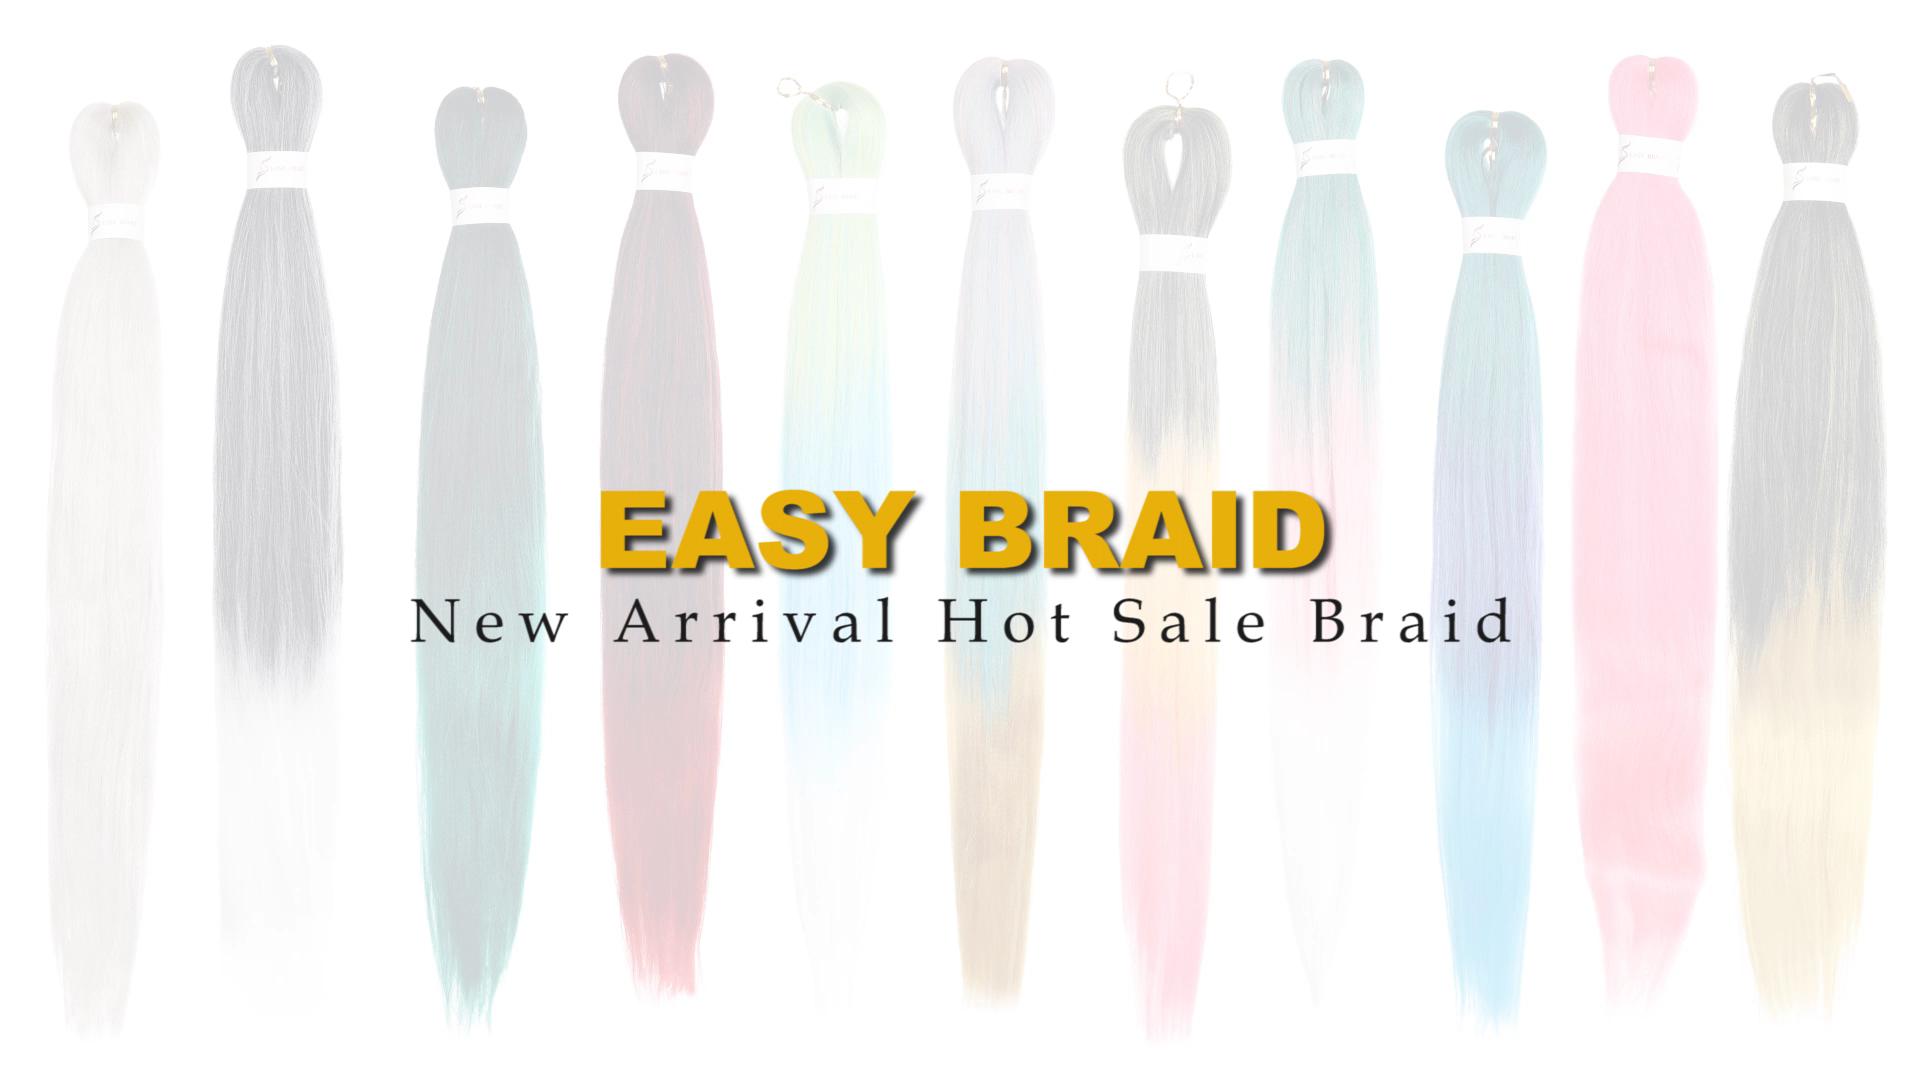 Kostenlose Probe Synthetische Pre Gestreckt Flechten Haar Für Großhandel Beste Günstige Braid Haar Smartbraid Synthetische Haar Geflecht